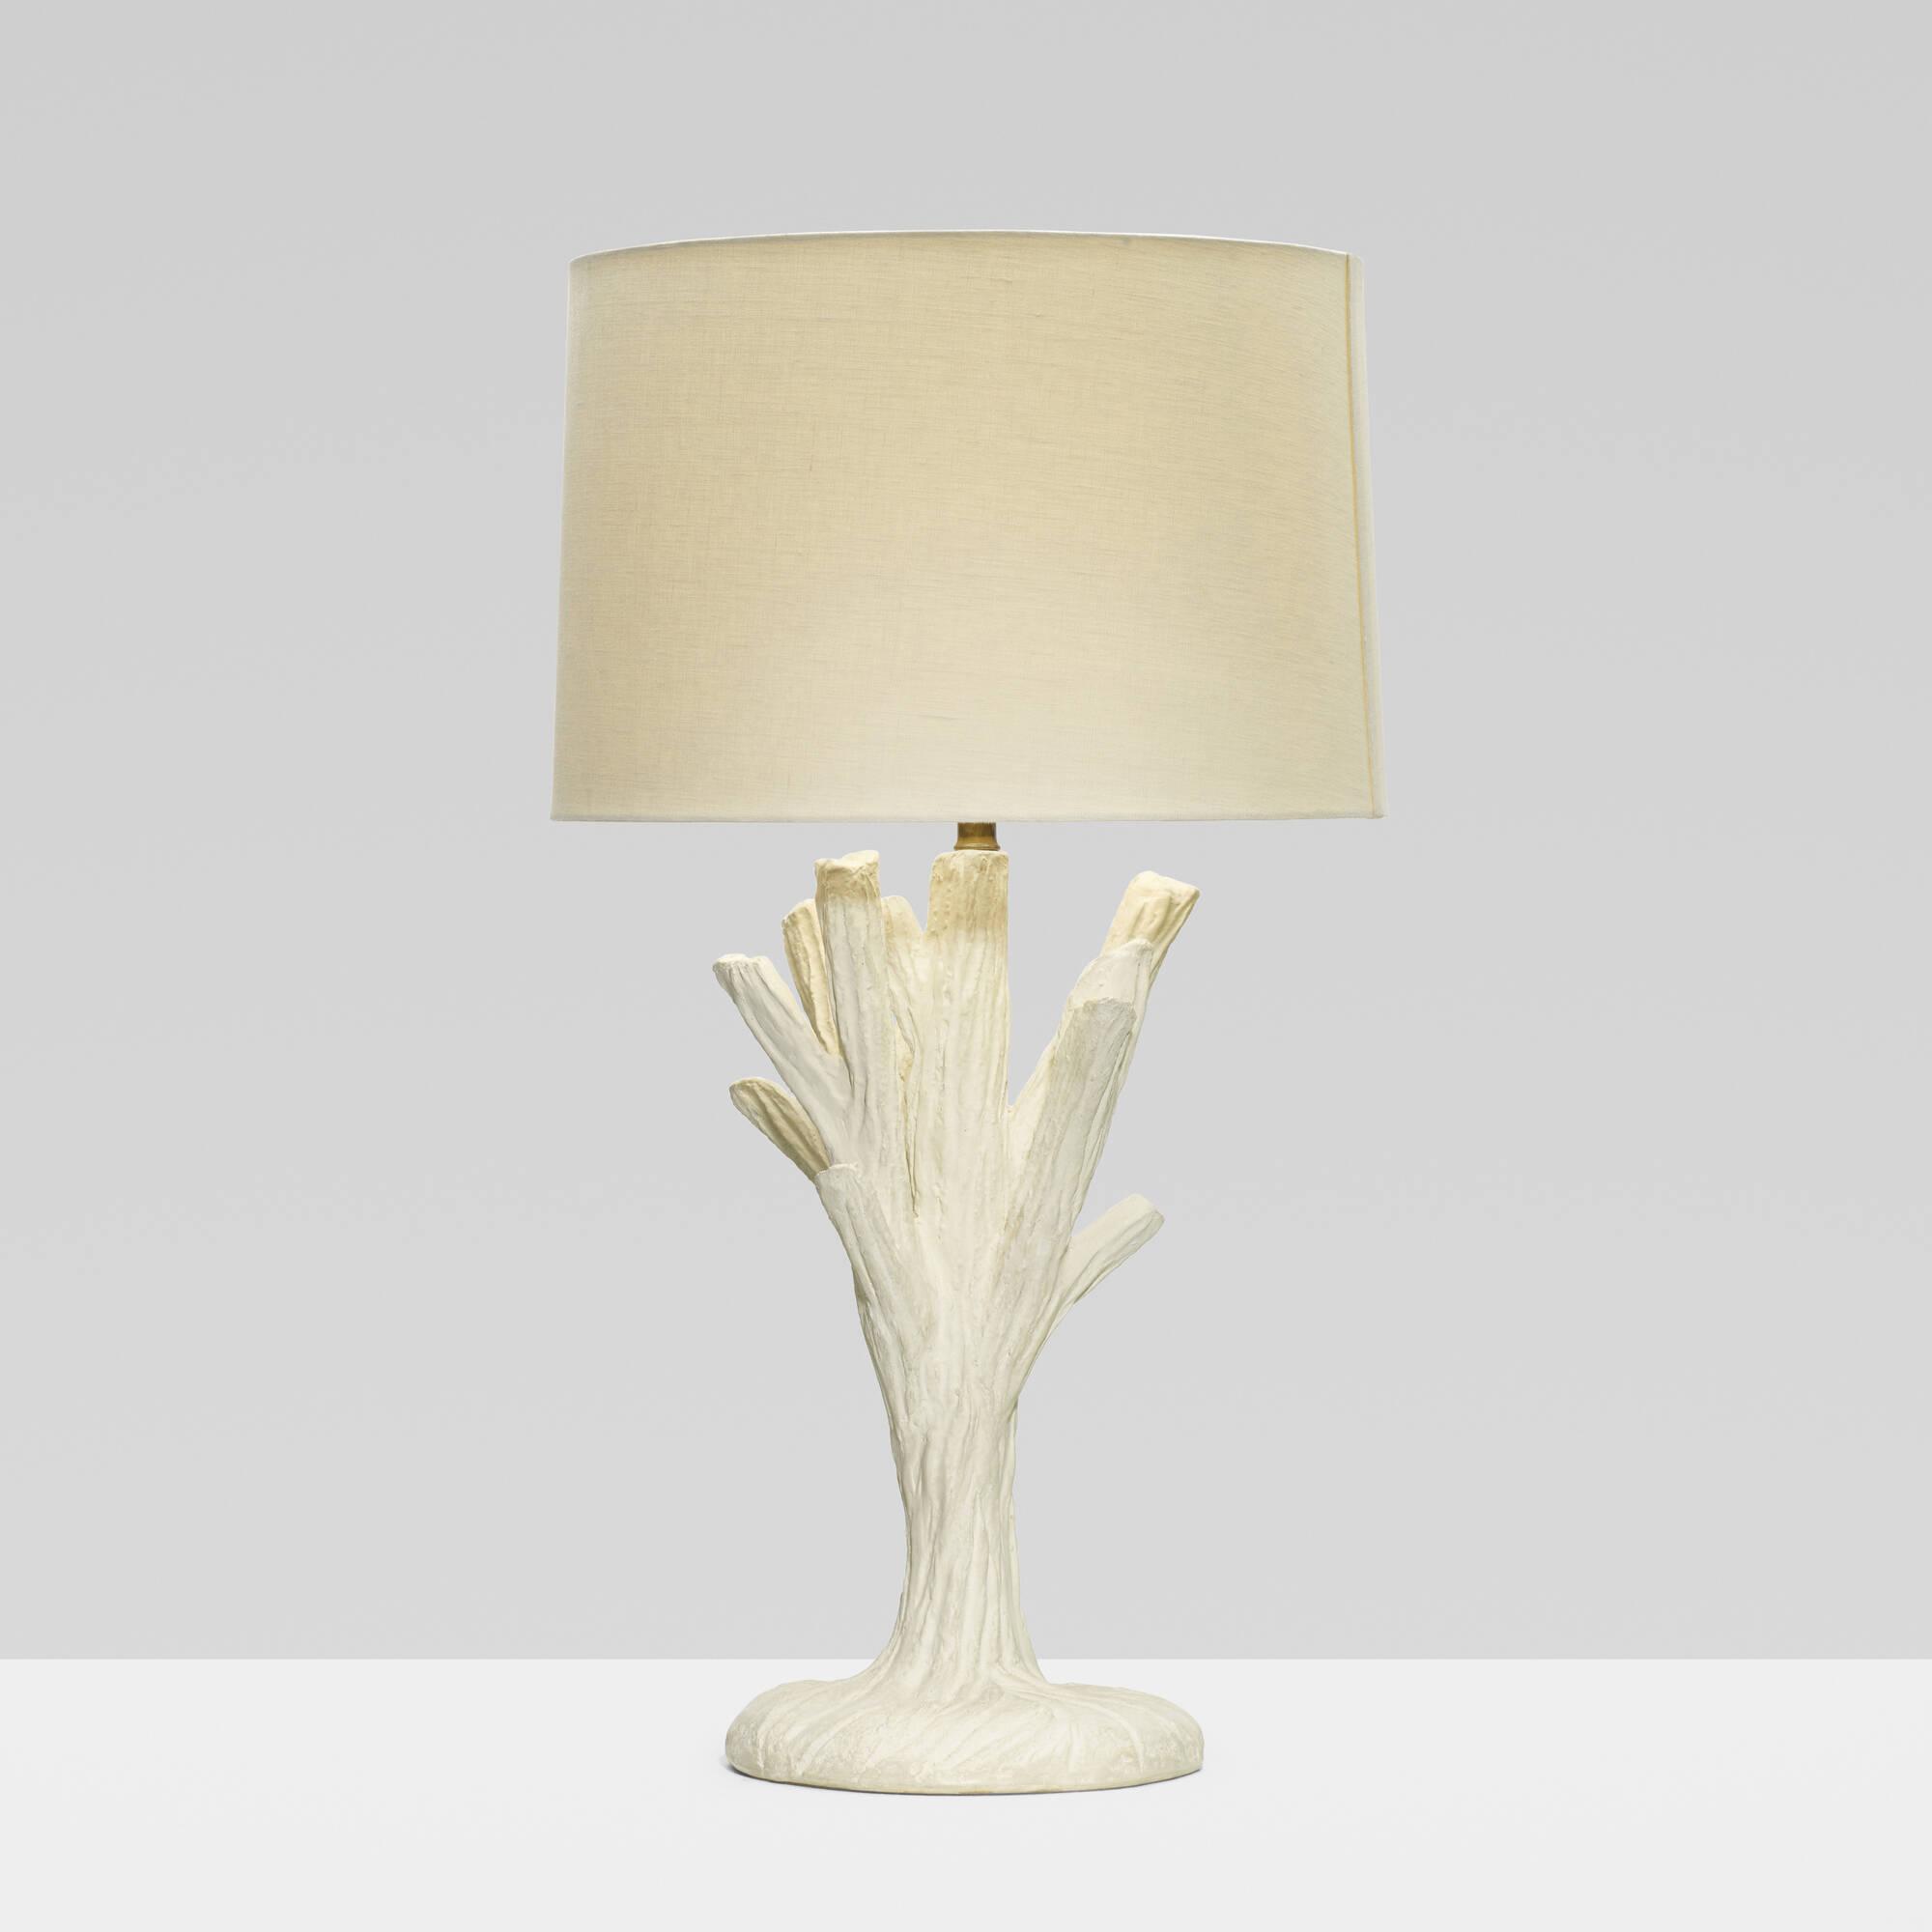 297: John Dickinson / branch table lamp (2 of 3)